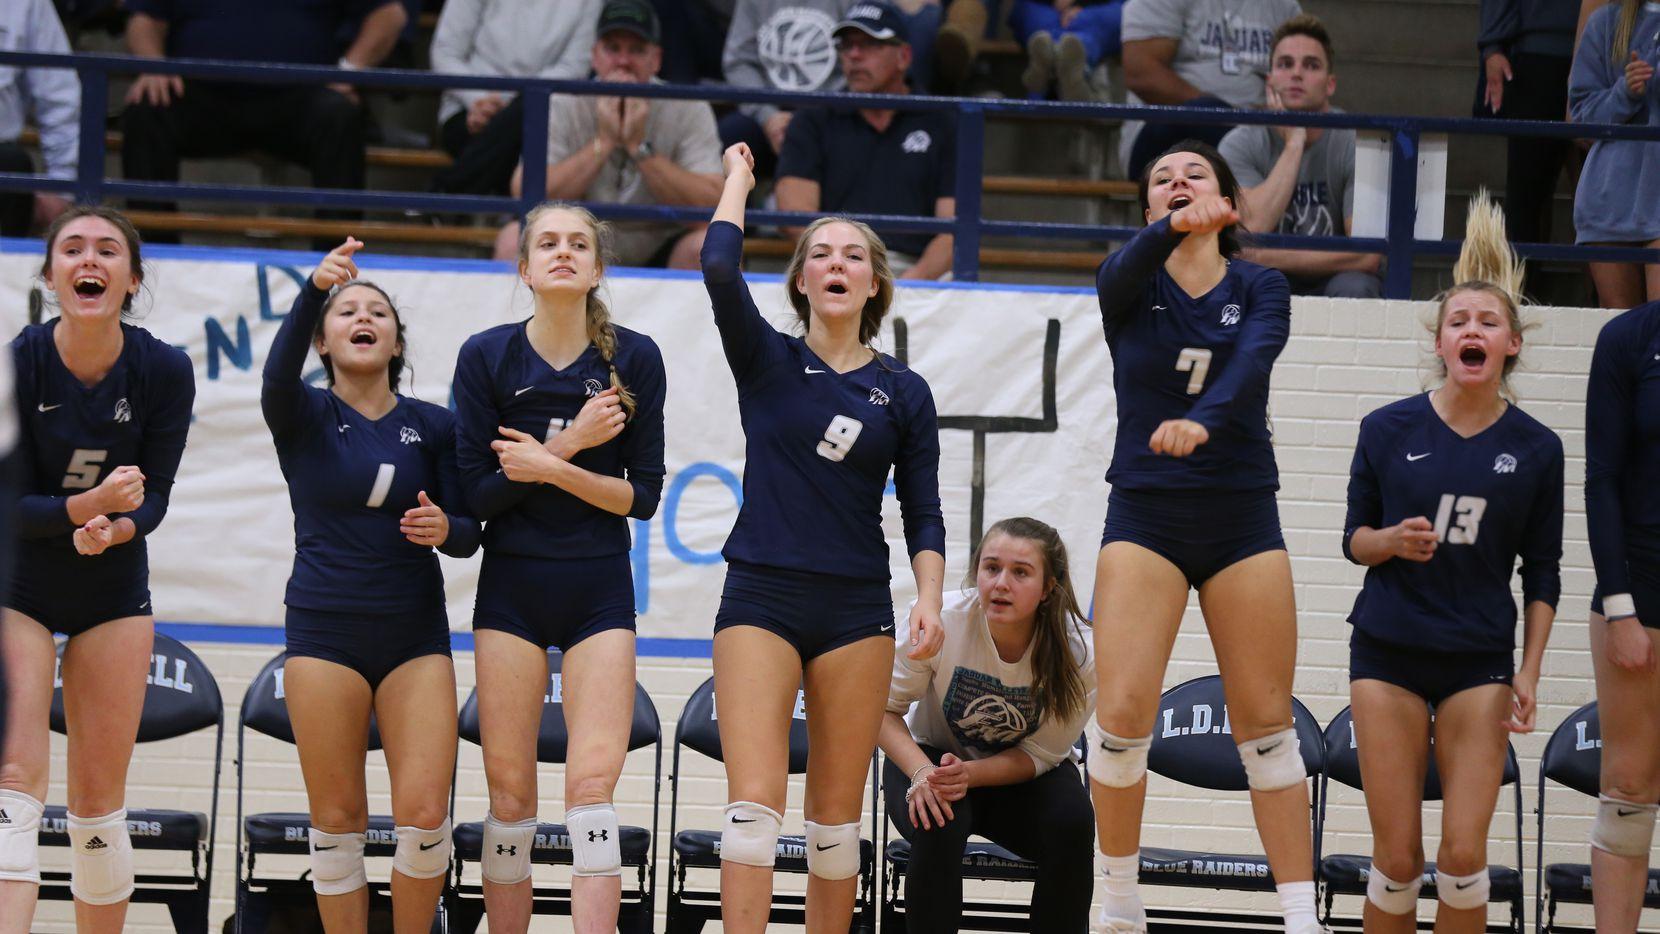 Reigning 6a State Volleyball Champ Flower Mound Sweeps Keller In Bi District Playoffs